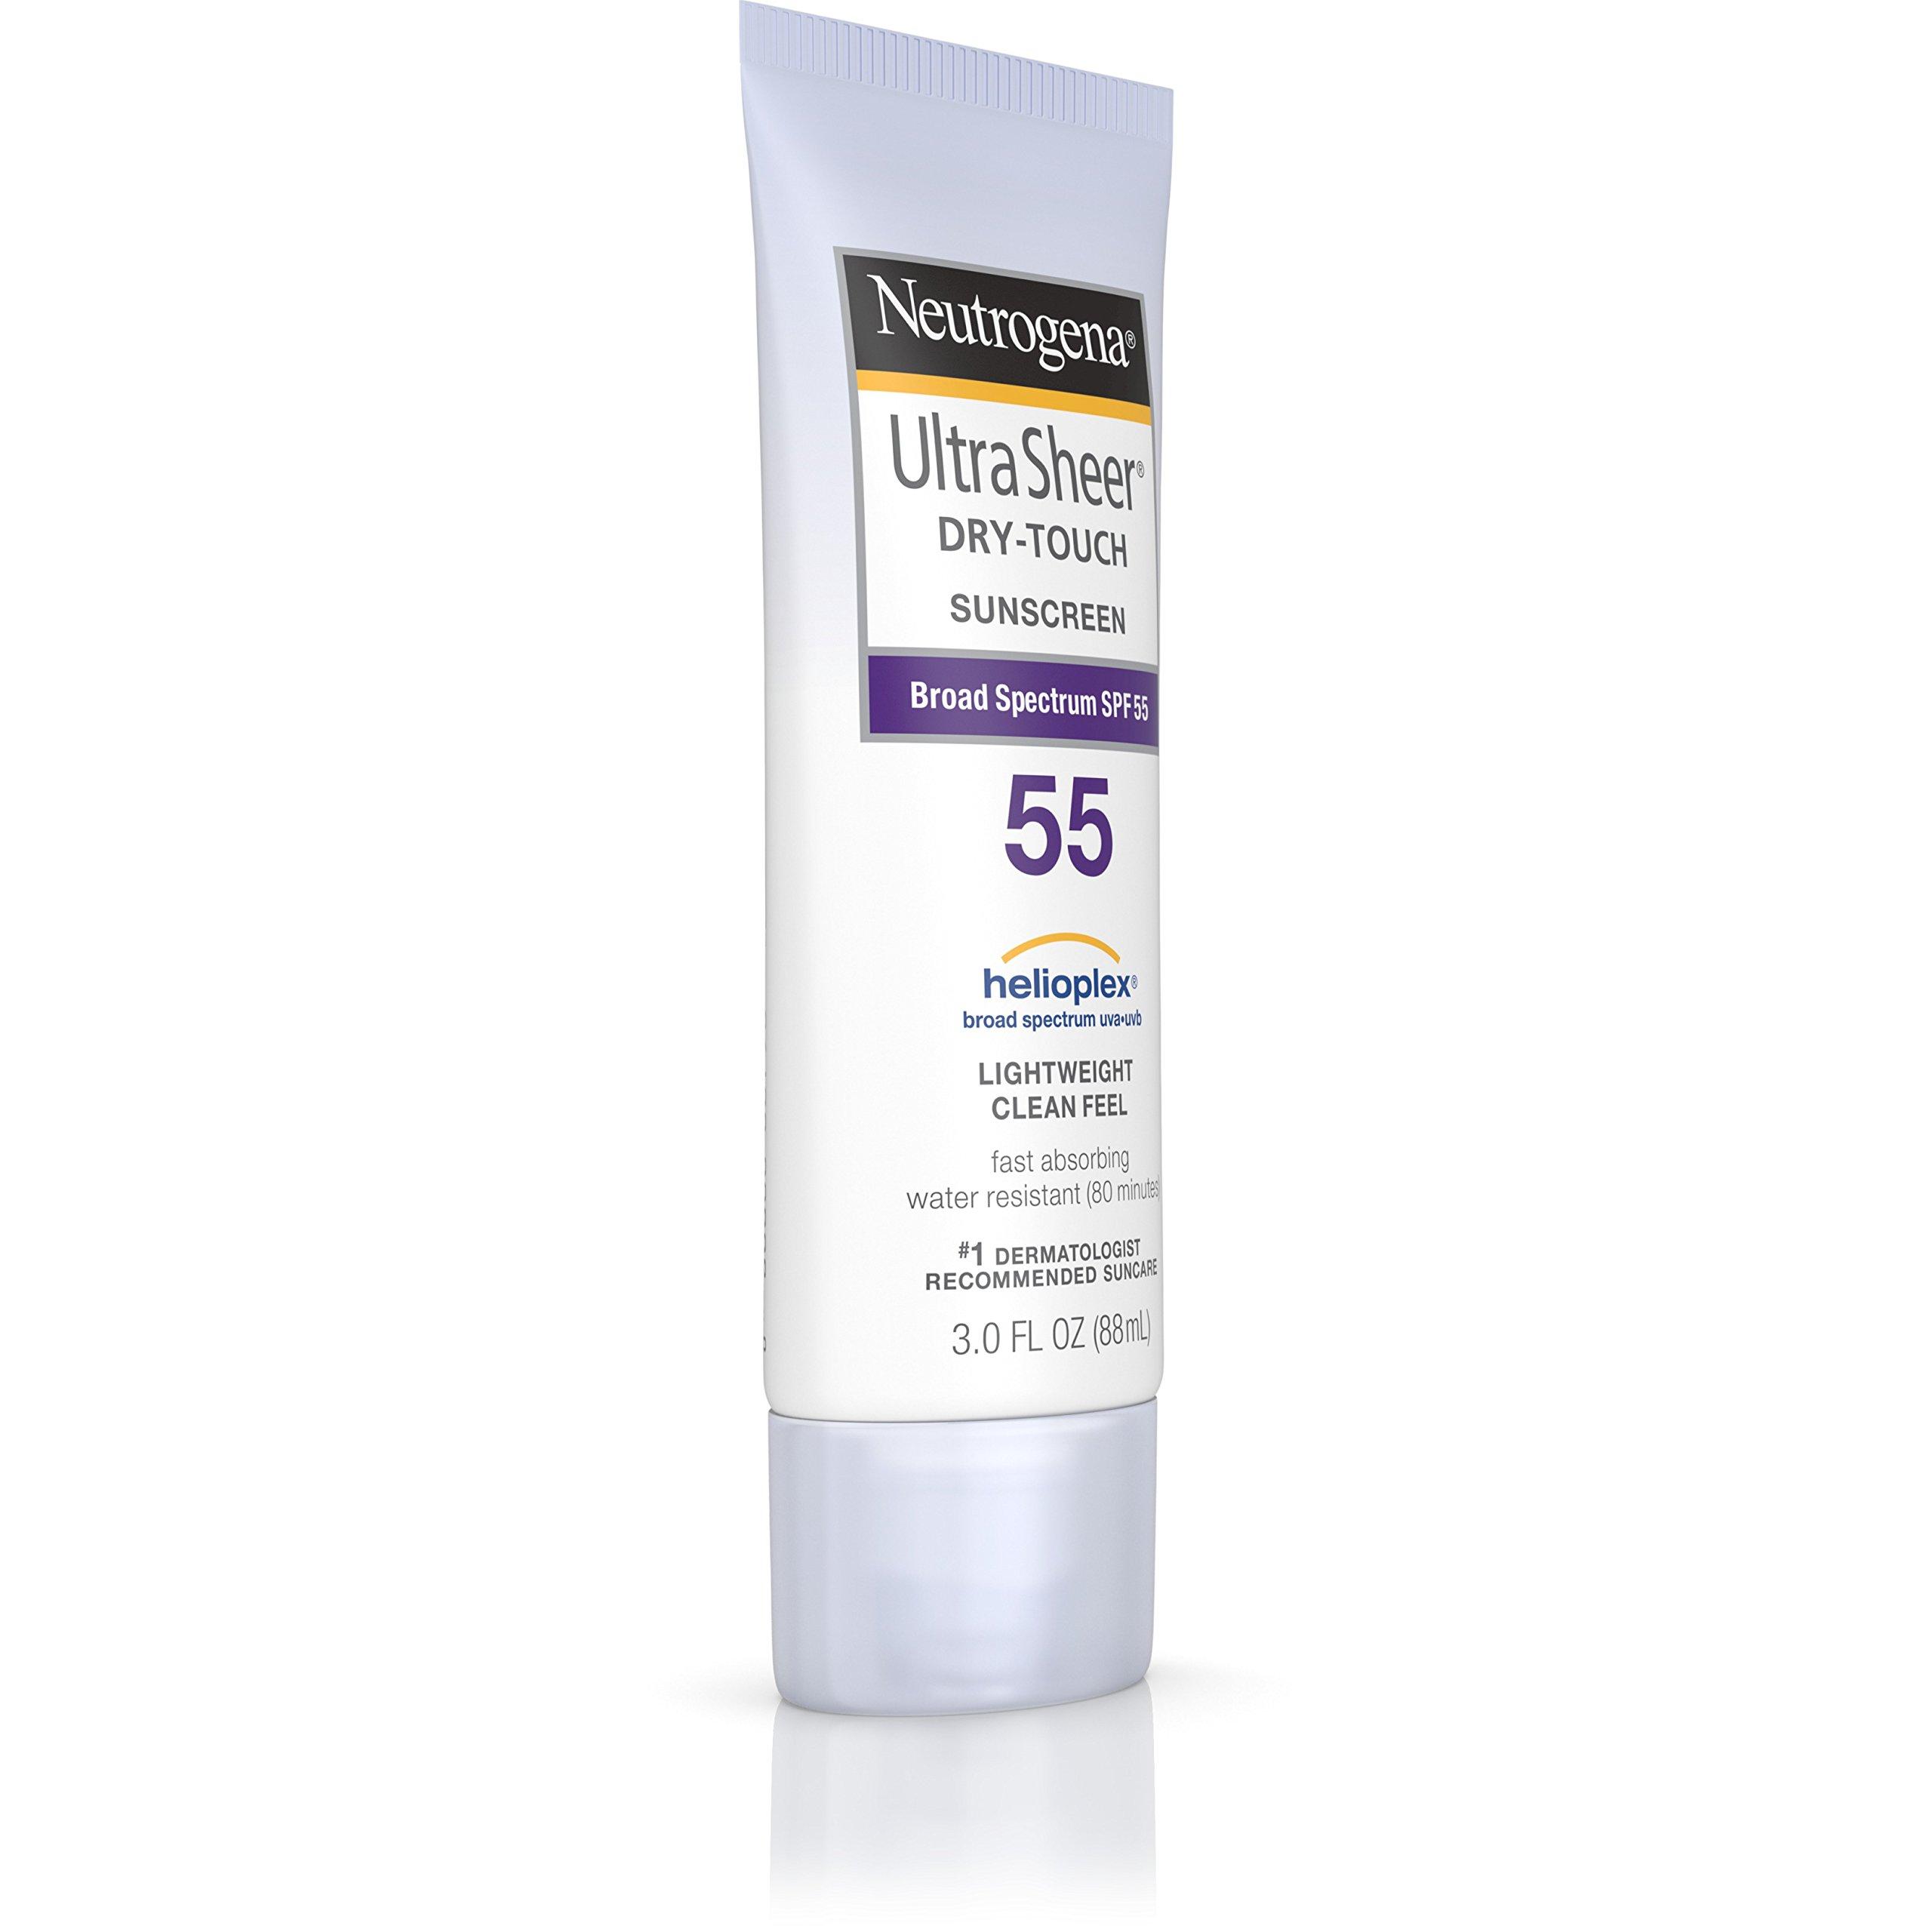 Neutrogena Ultra Sheer Dry-Touch Sunscreen Broad Spectrum SPF 55, 3 fl. oz.